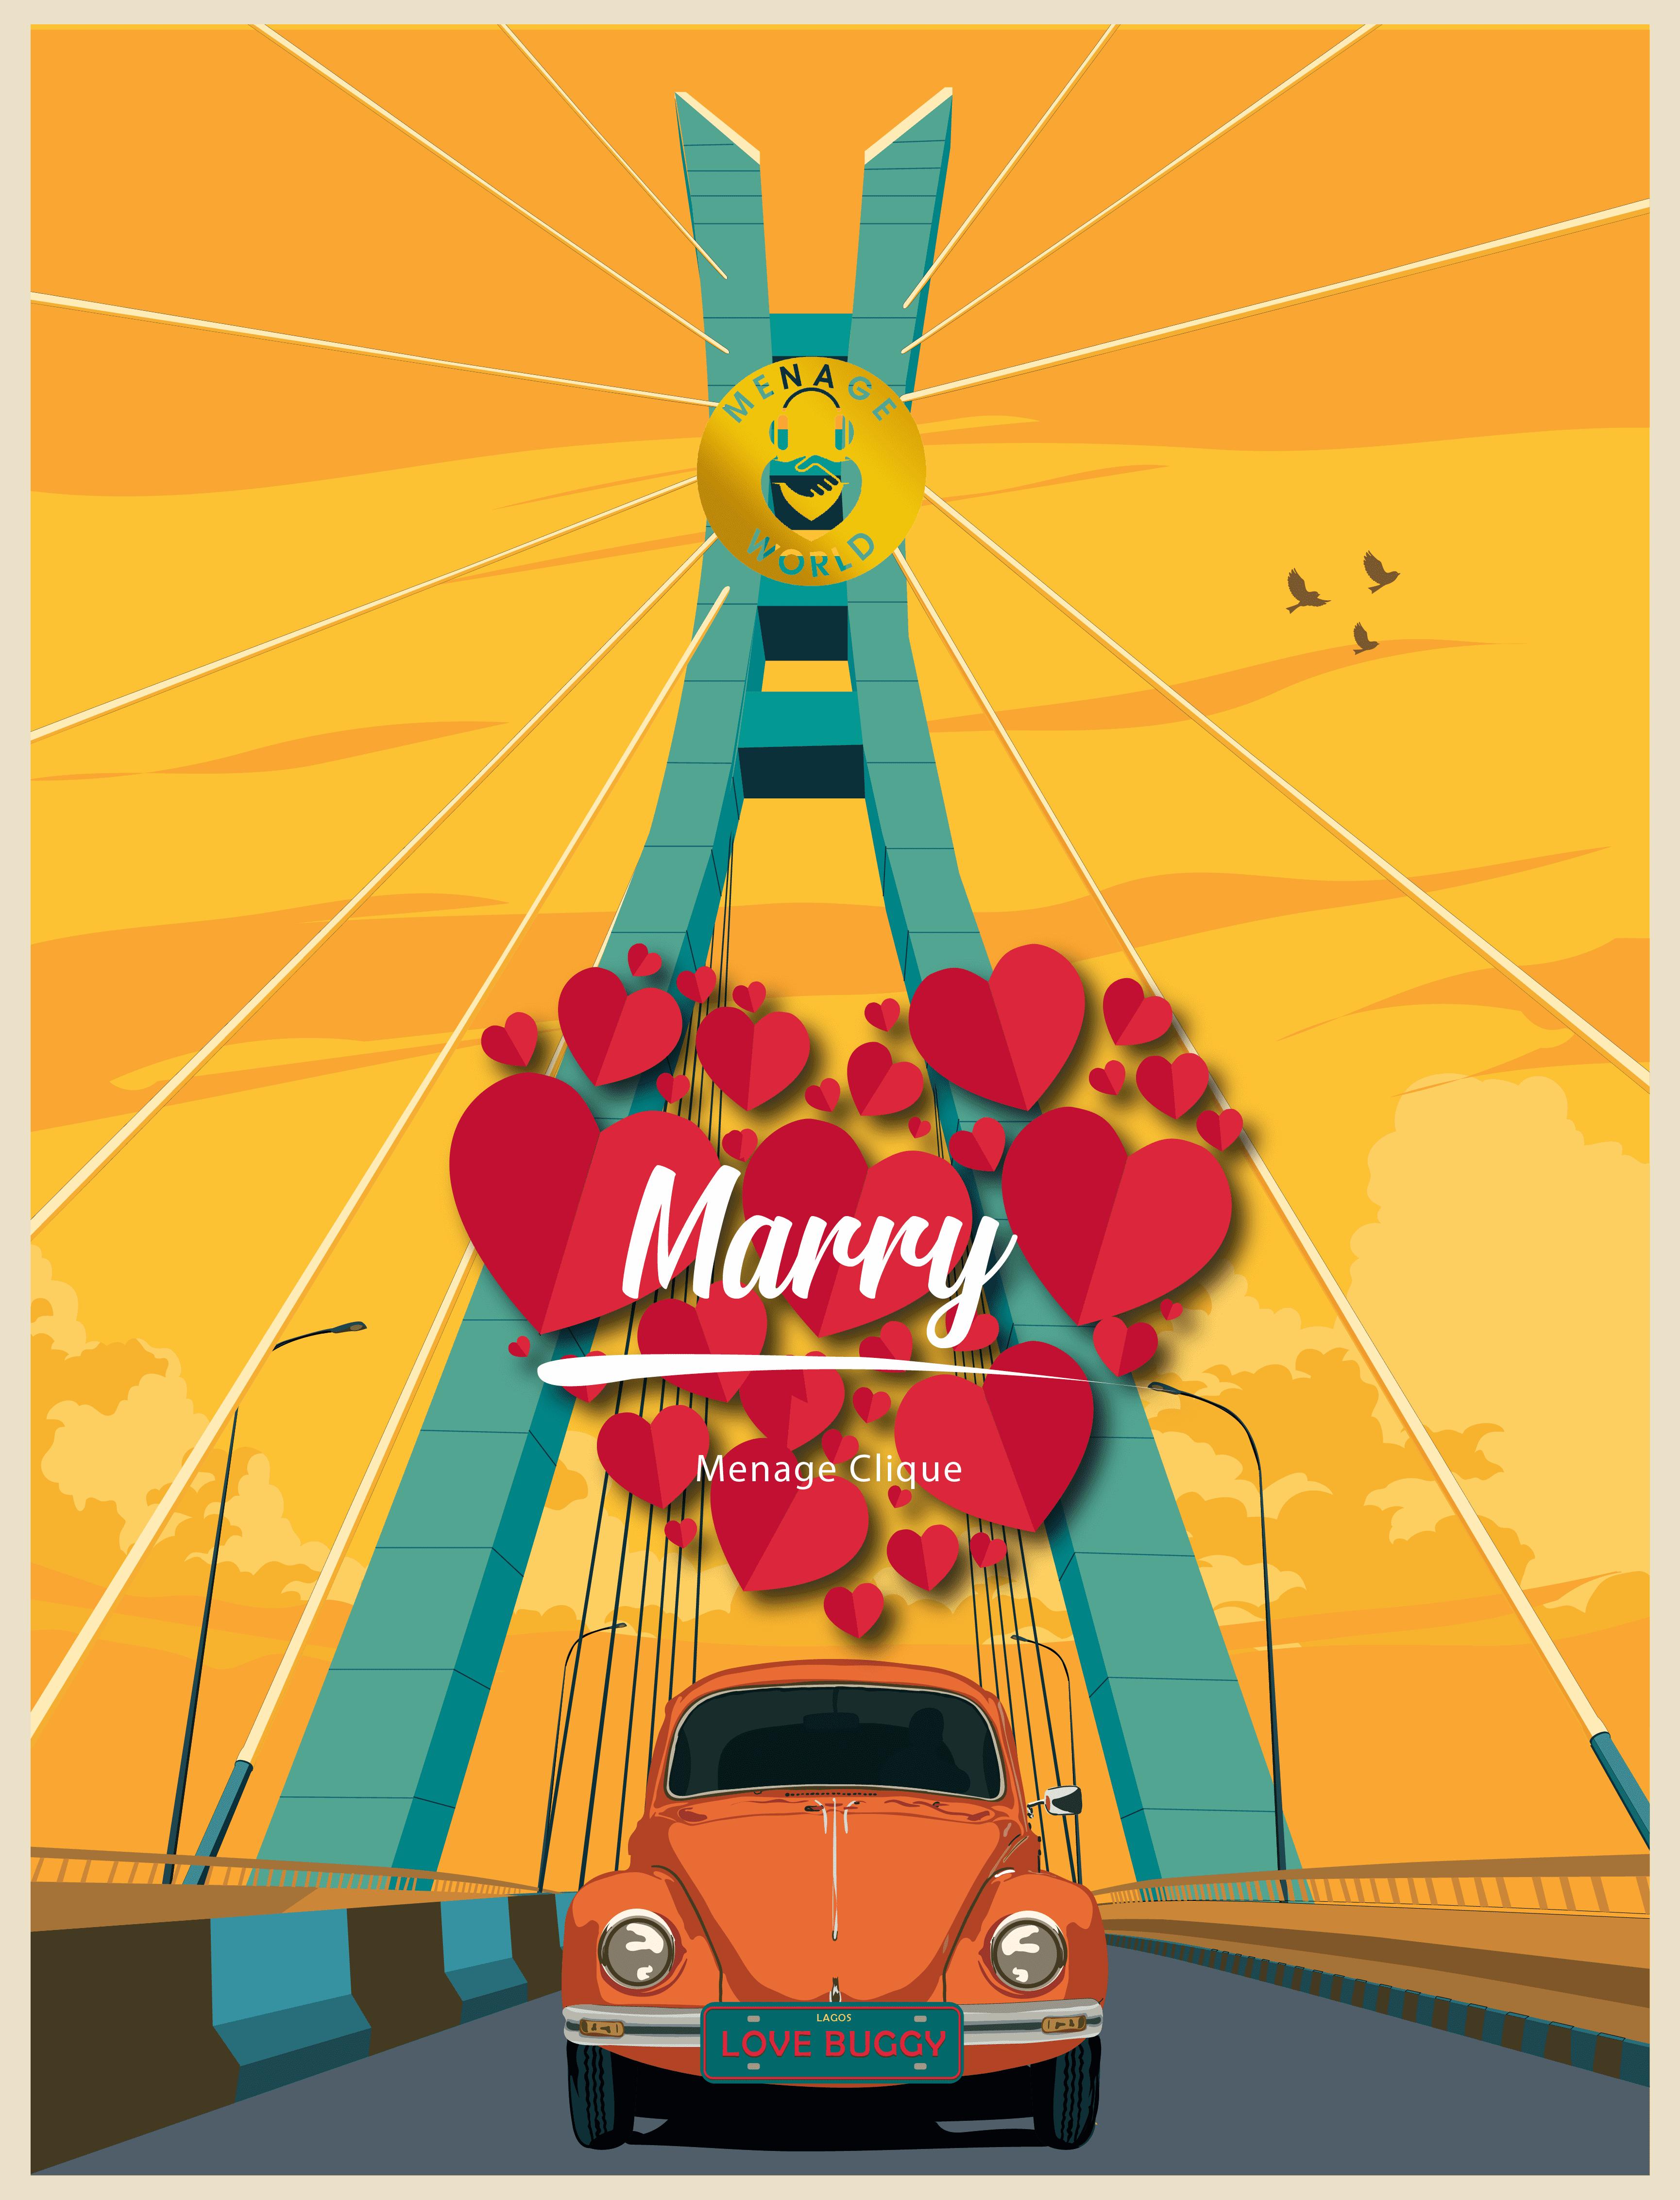 MenageClique – Marry